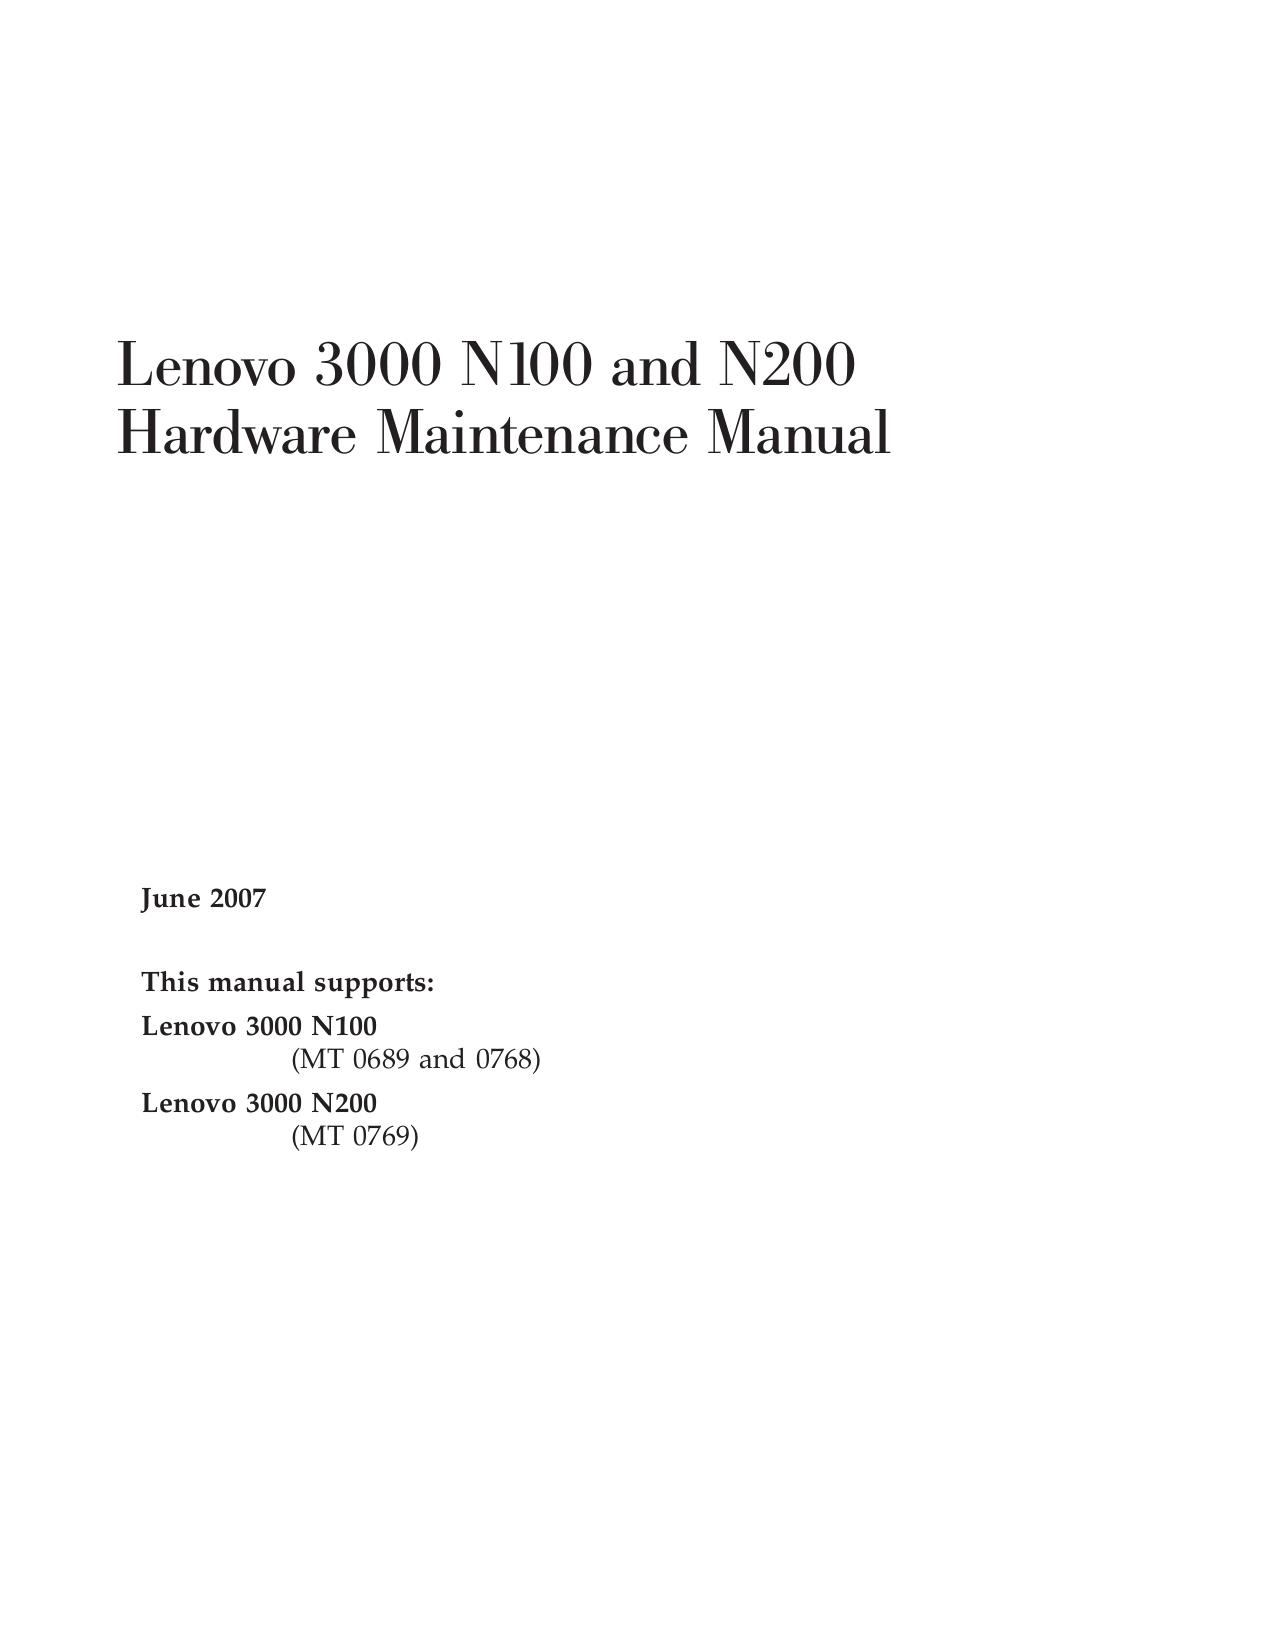 pdf for Navigon GPS N100 manual